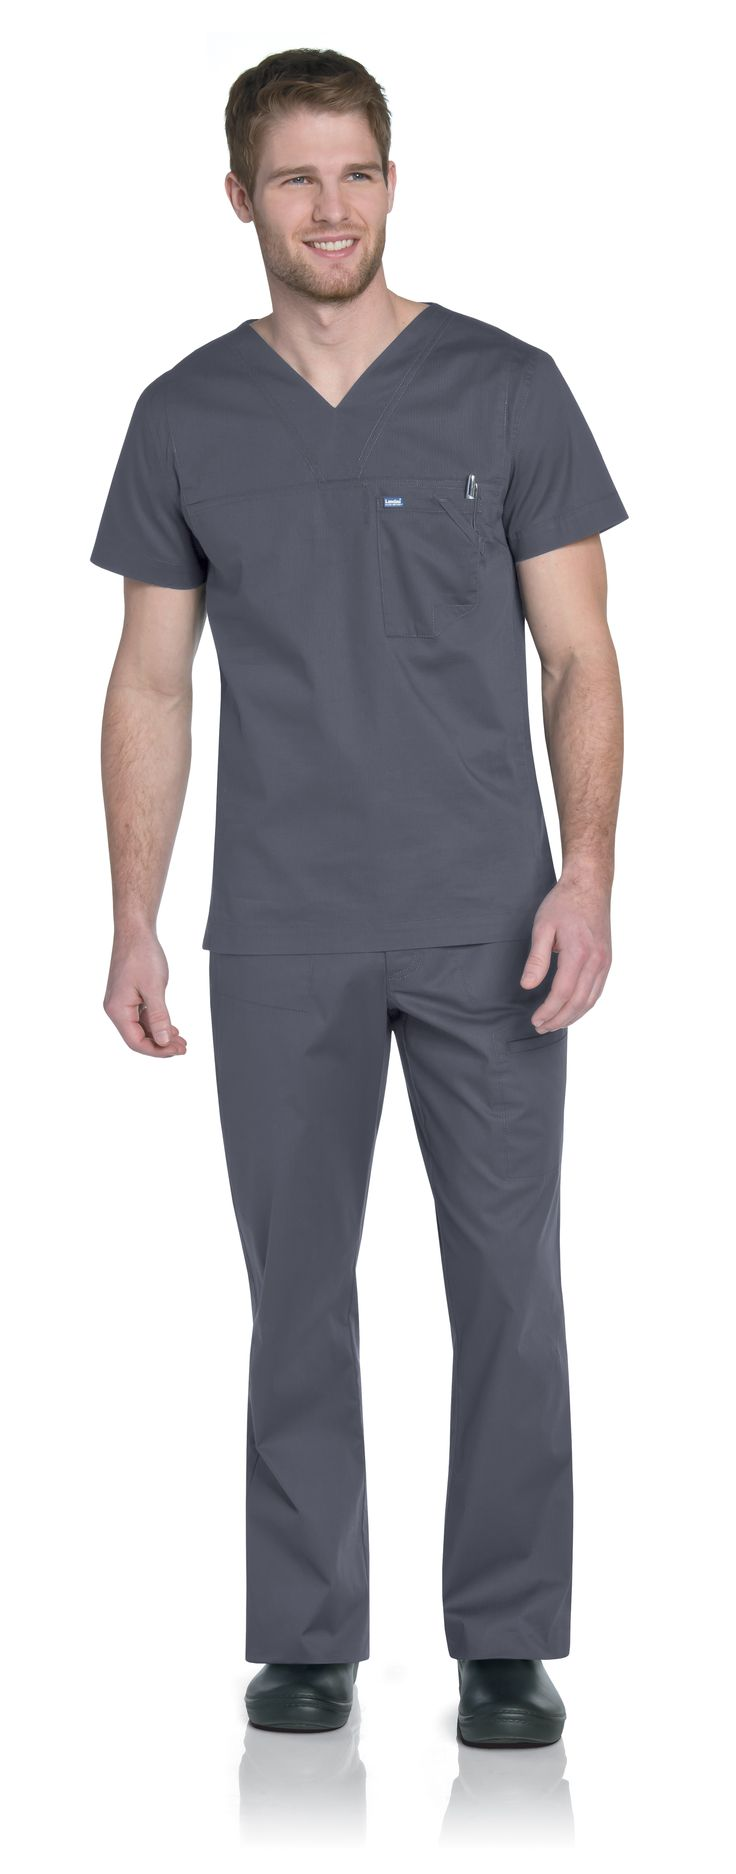 NEW! Landau Men's 4127 Tunic #Landau #Uniforms #Medical #Fashion #Scrubs #Health…